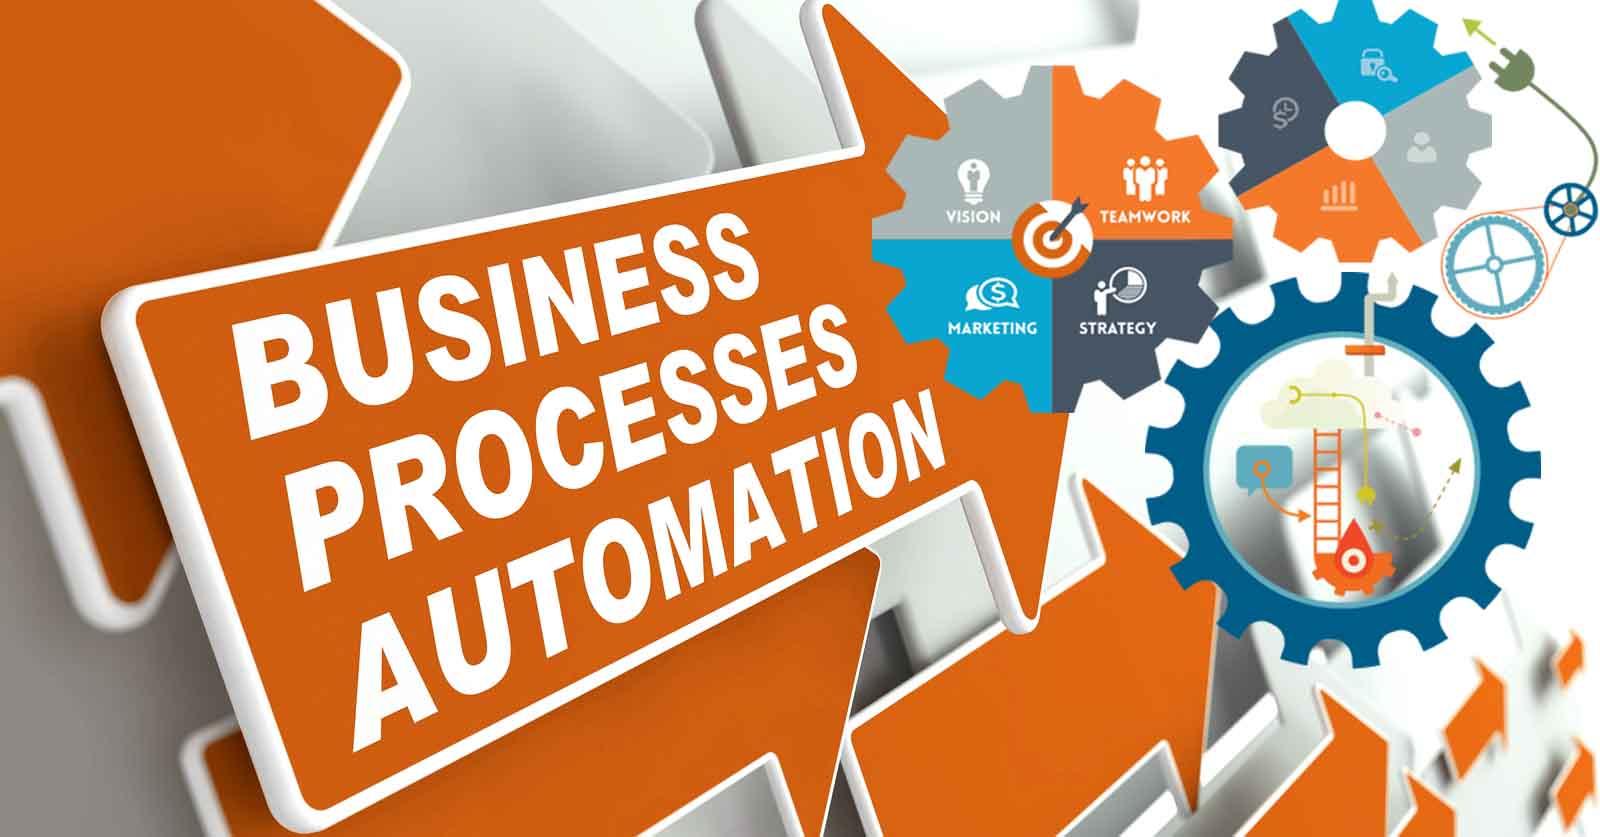 Business Process Automation.jpg